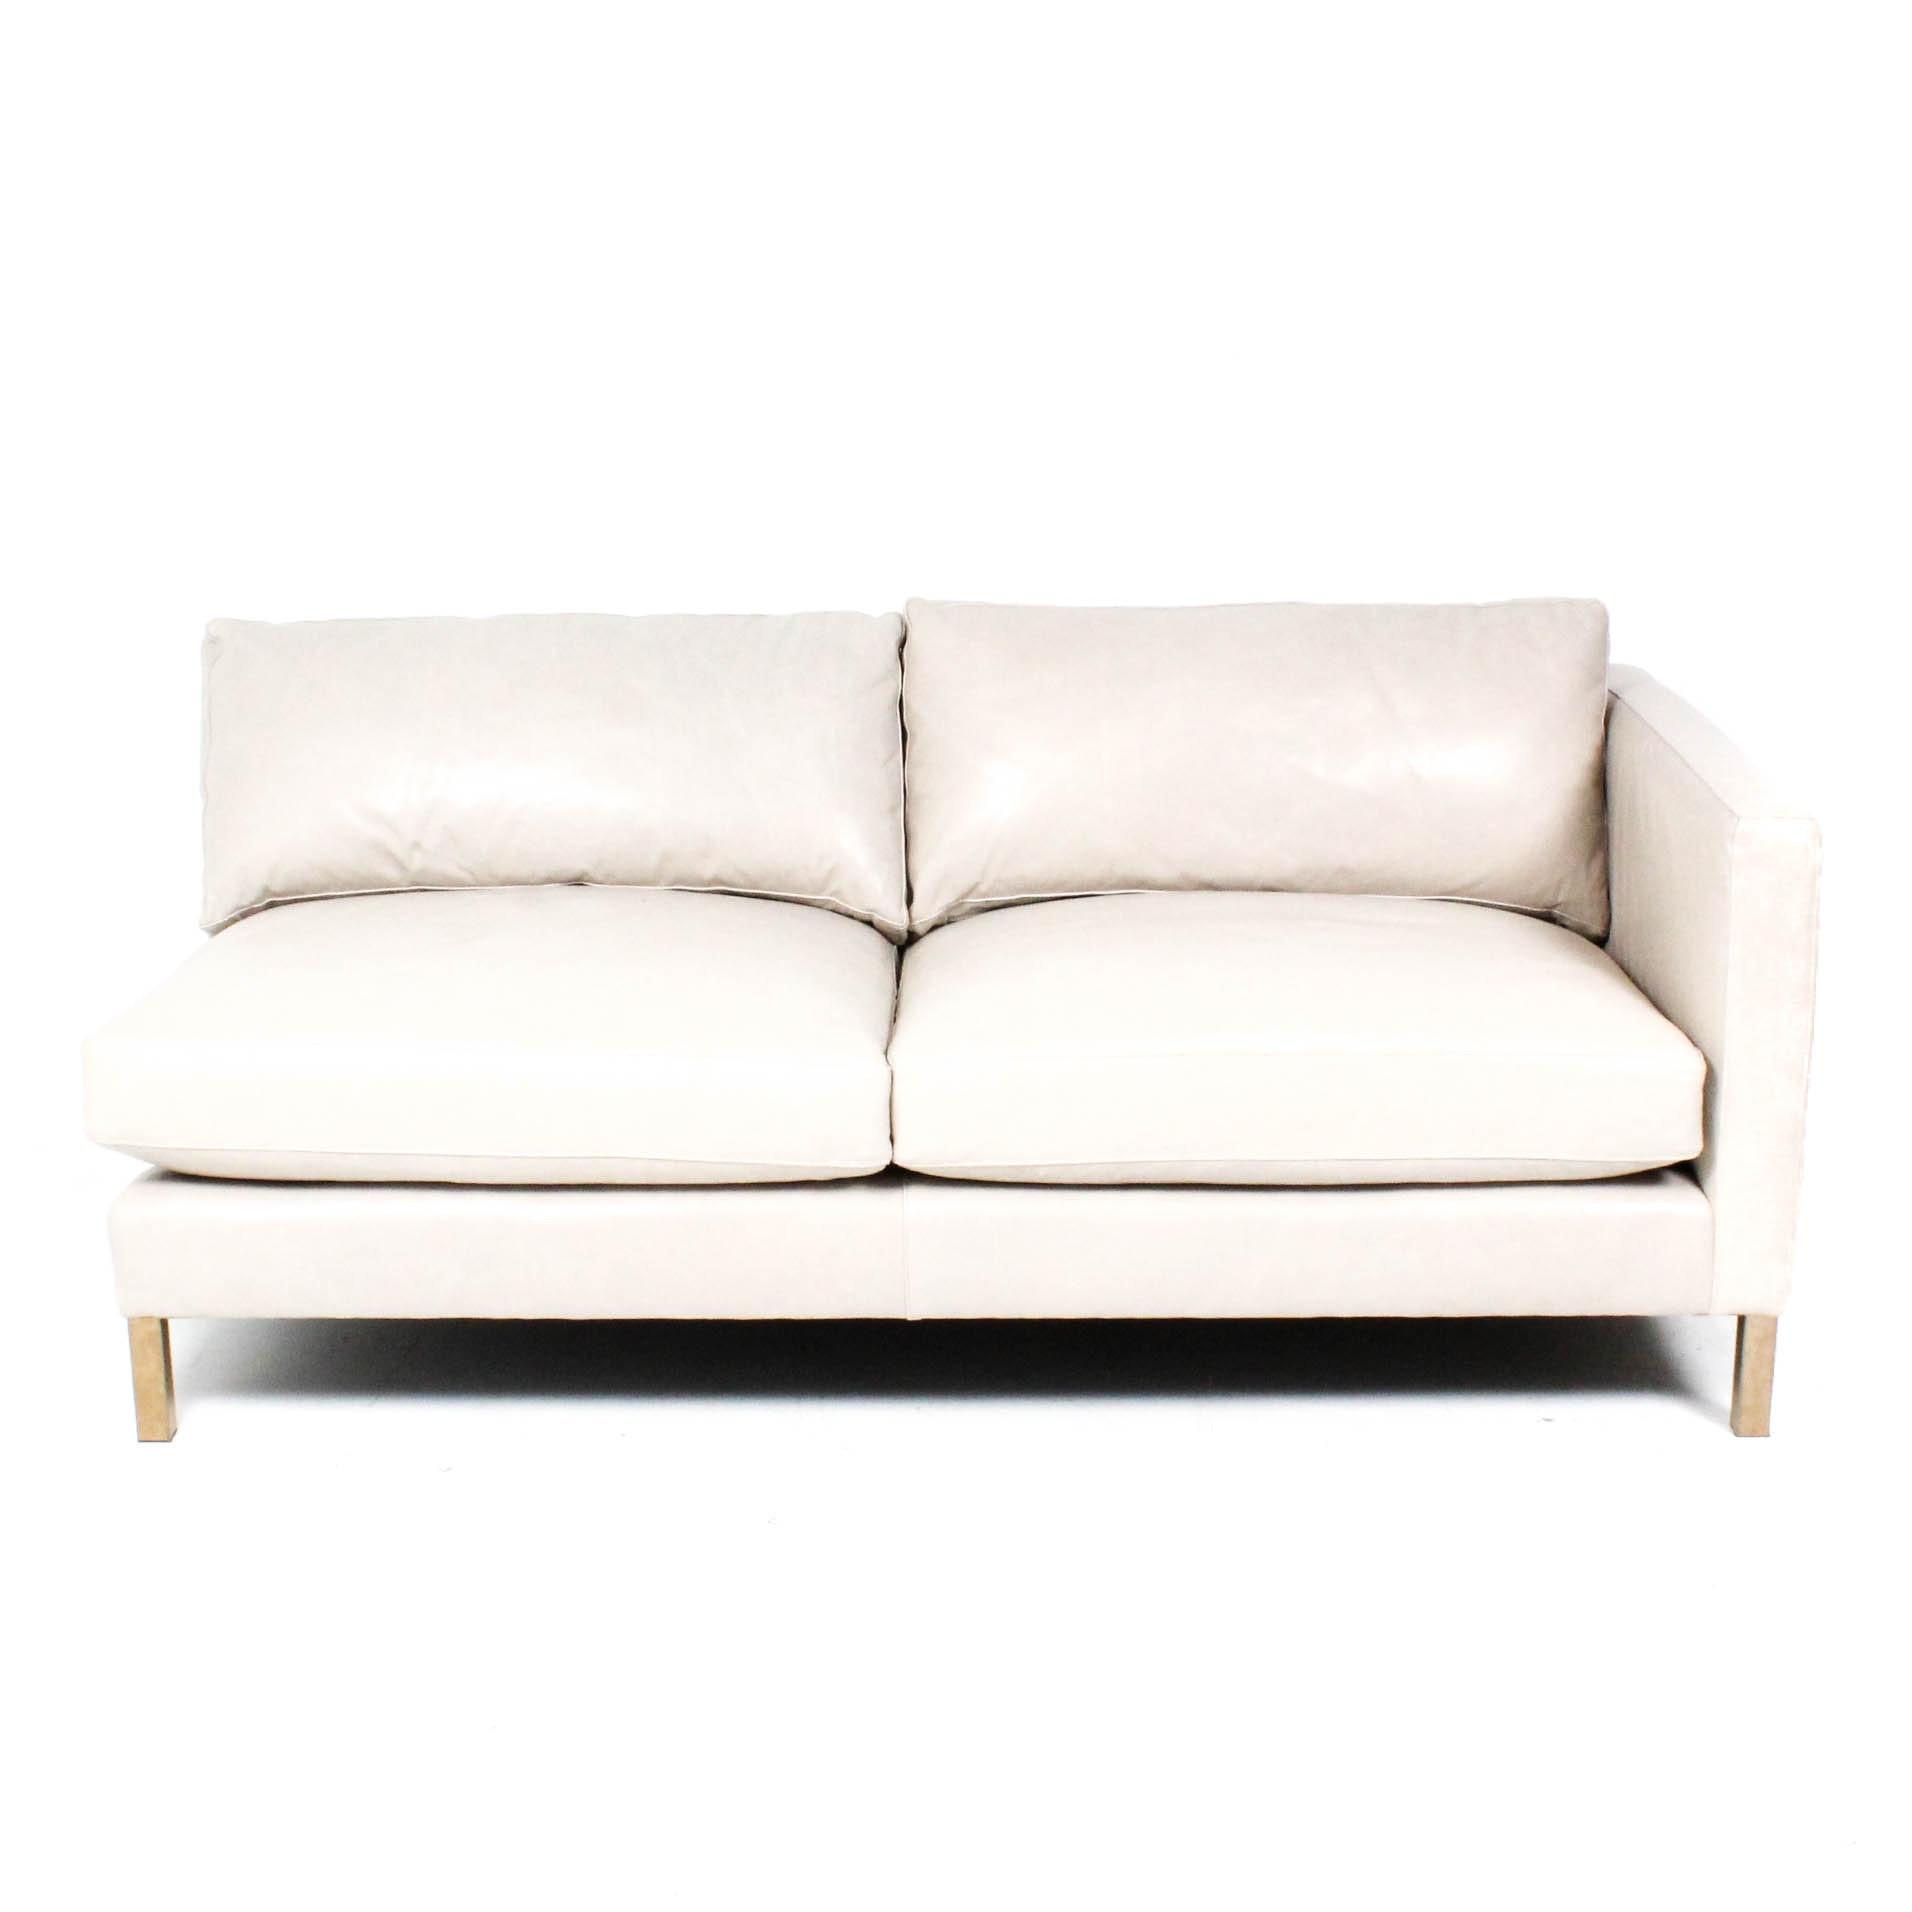 Arhaus Leather Sofa